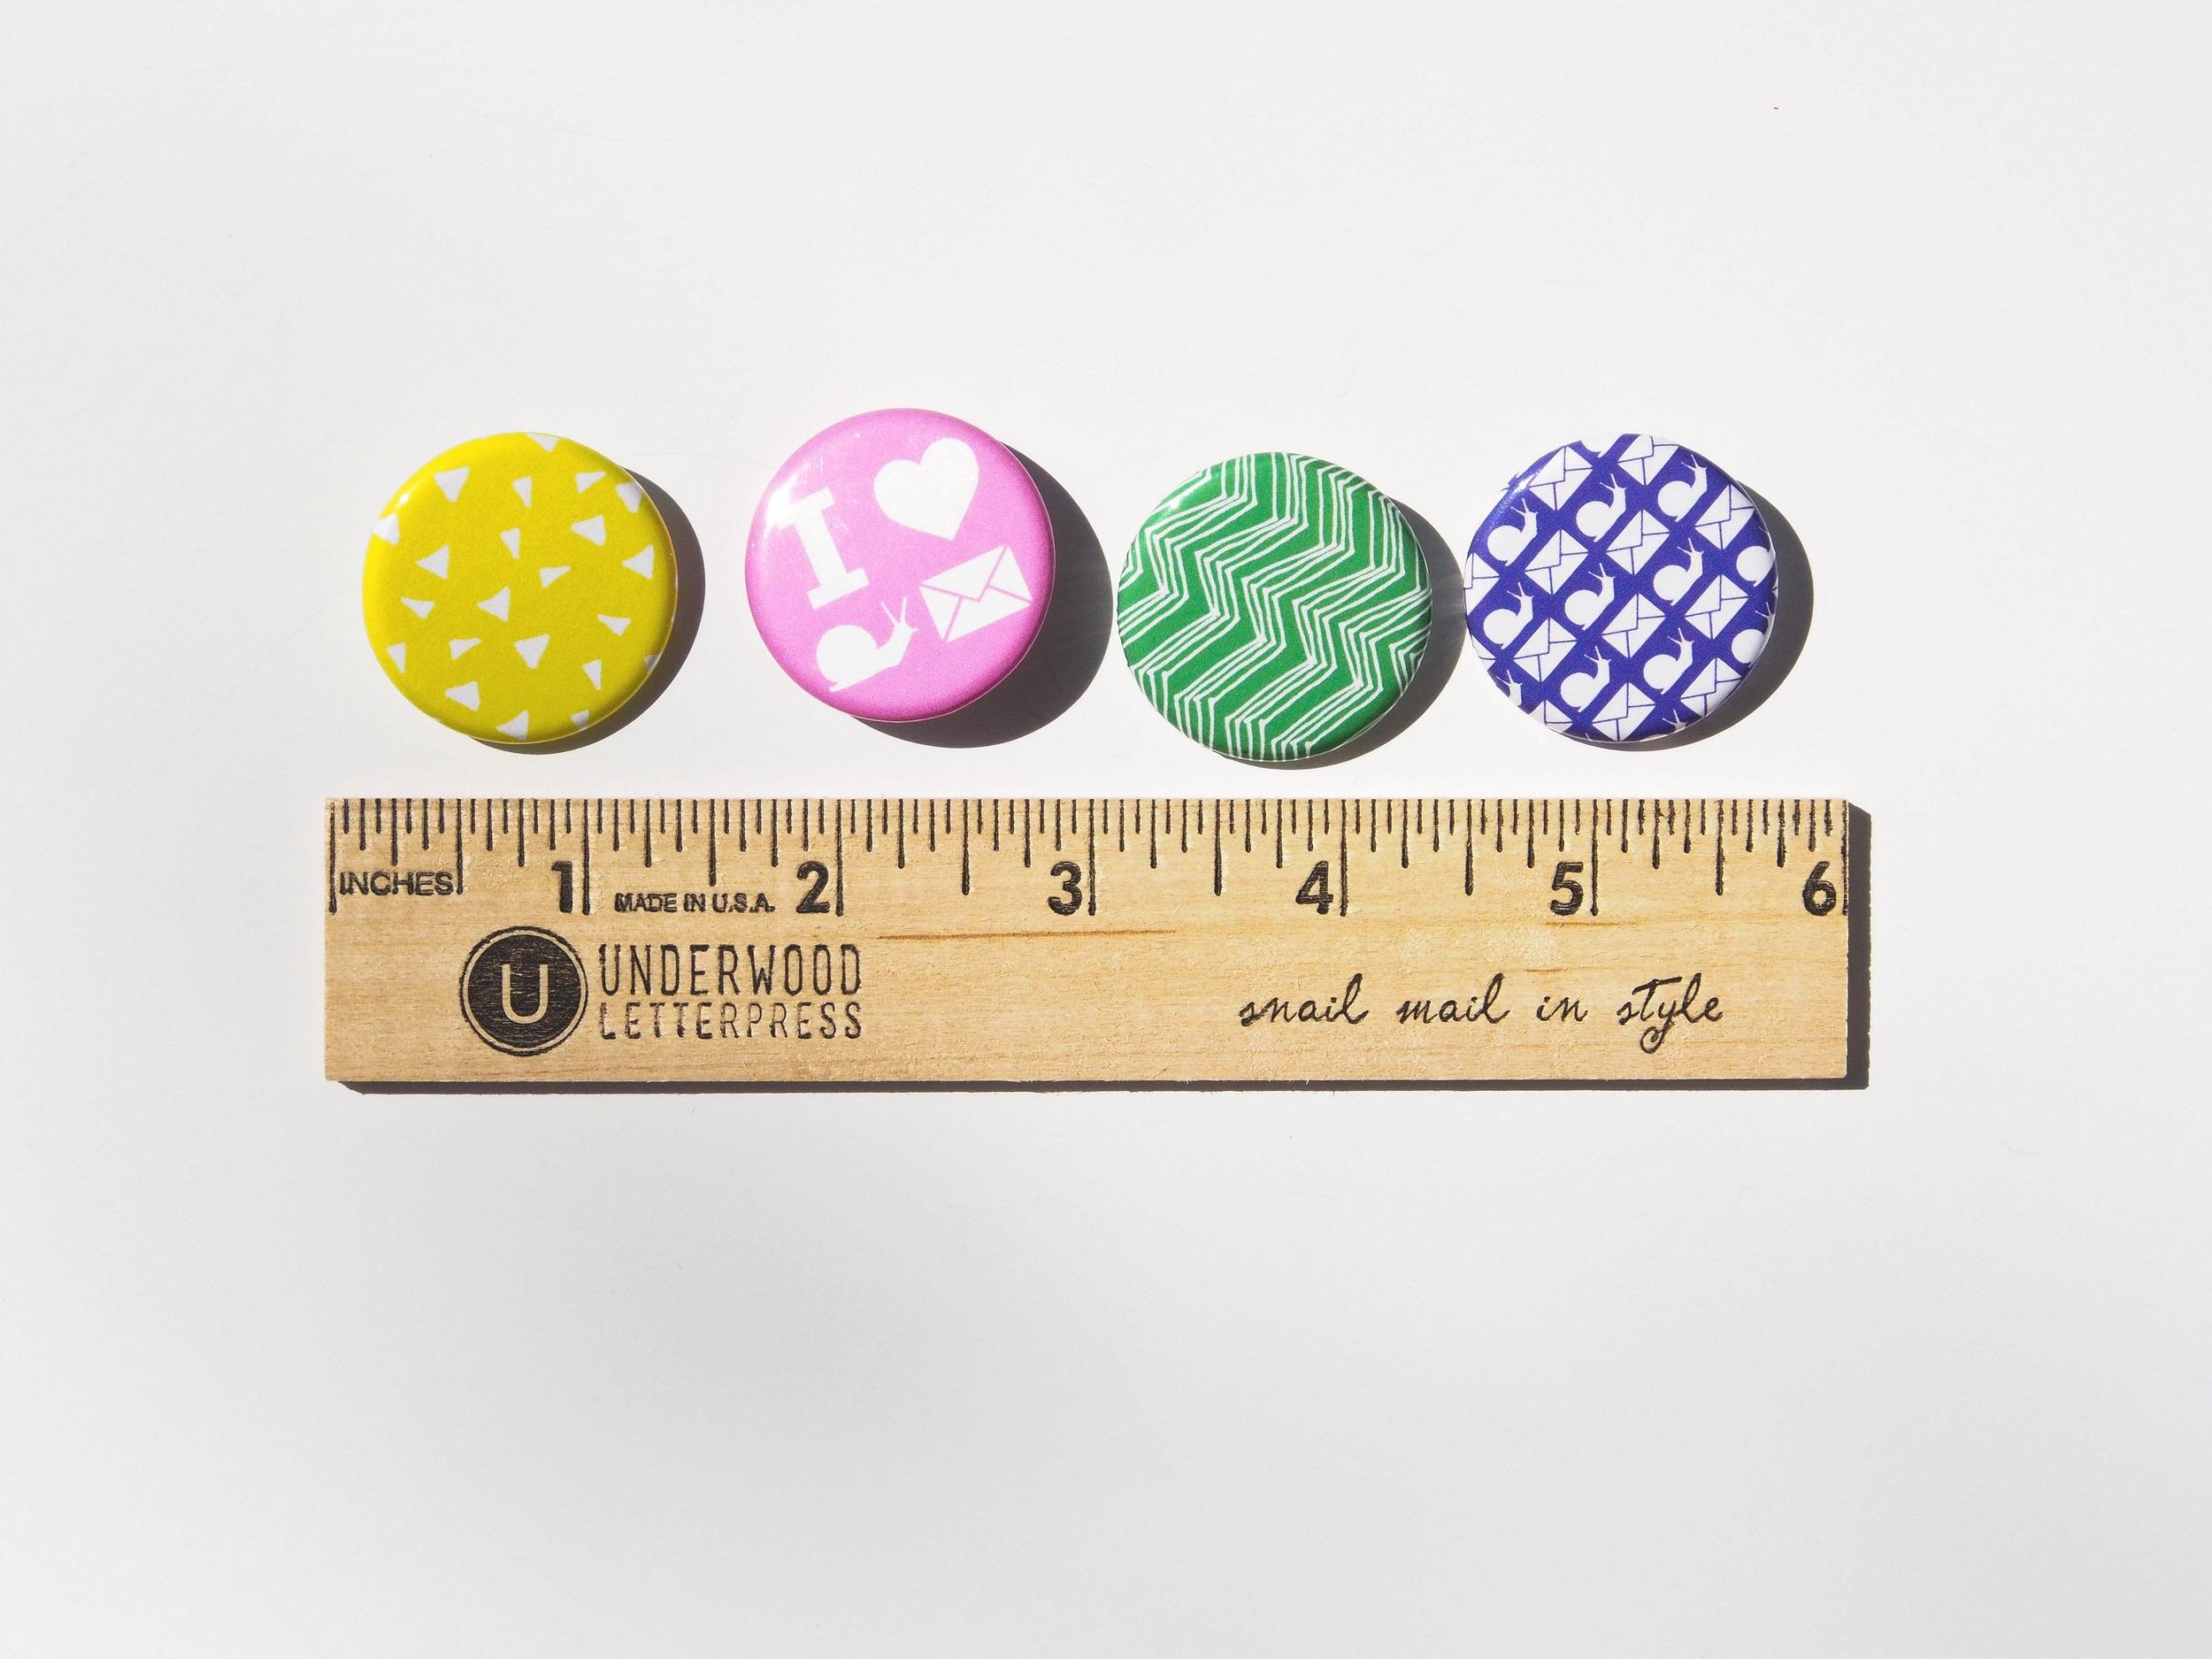 snail mail-9.jpg